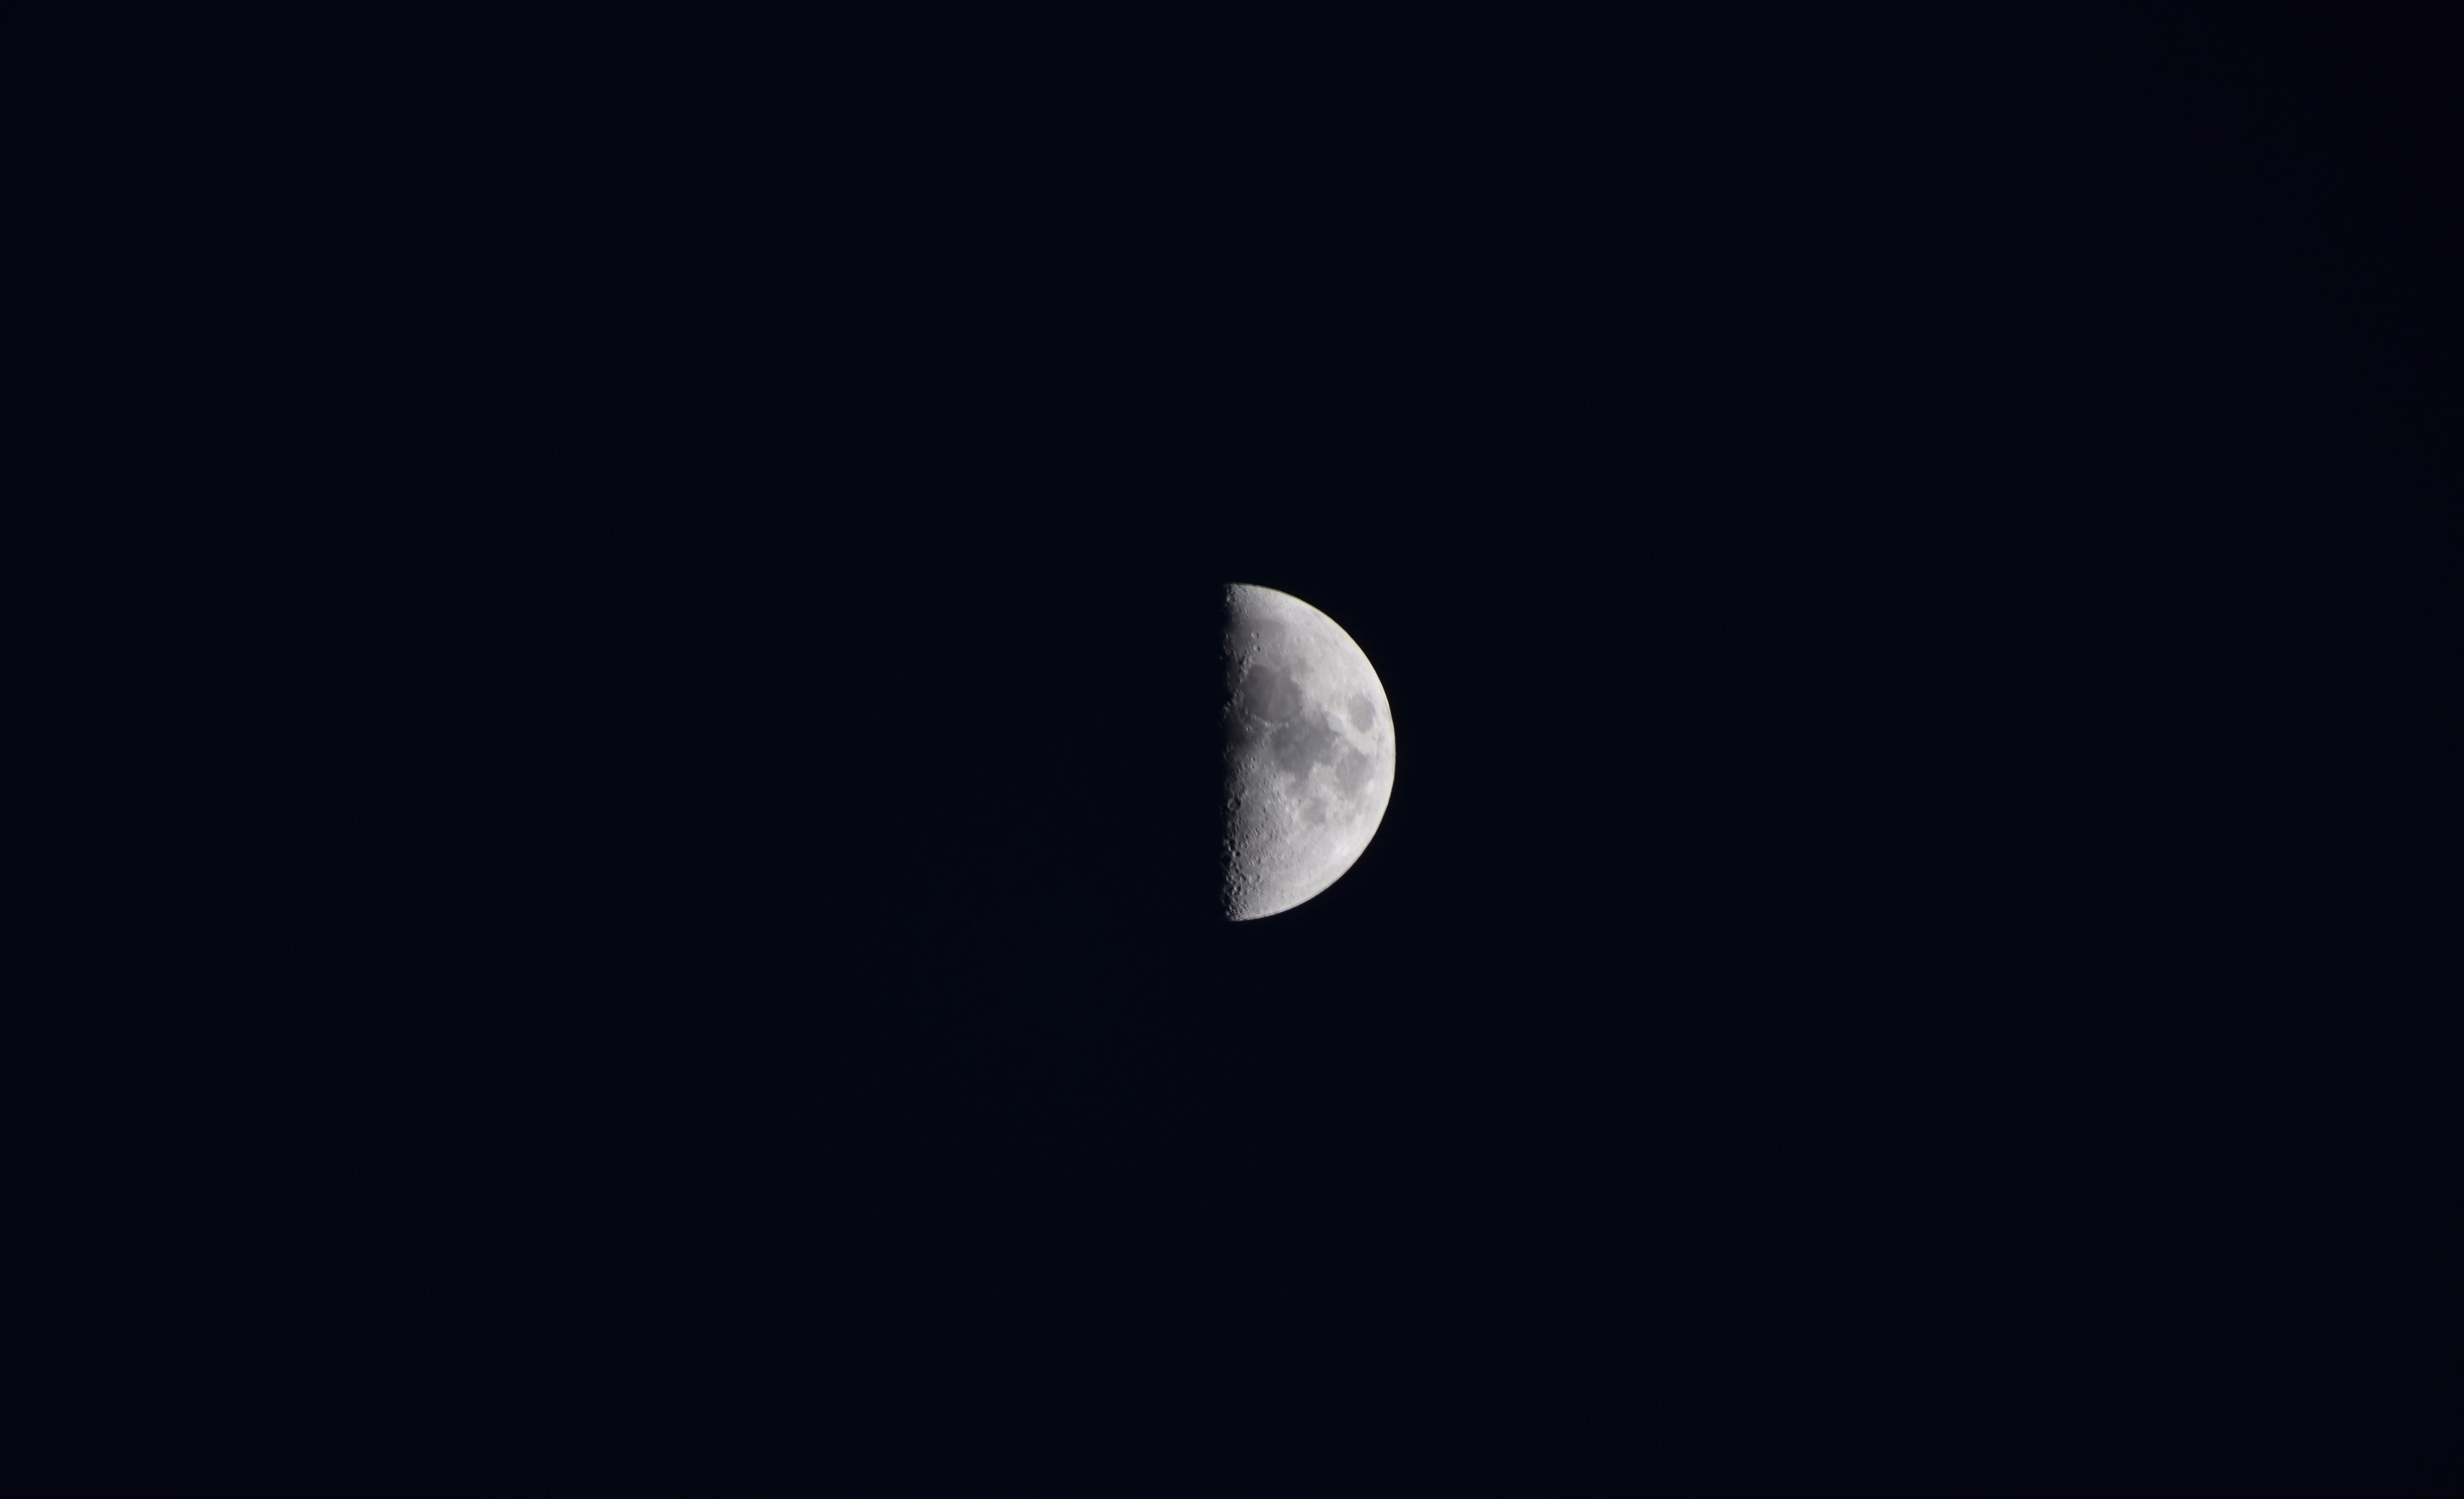 Free stock photo of dark, Dark Sky, half moon, half-moon